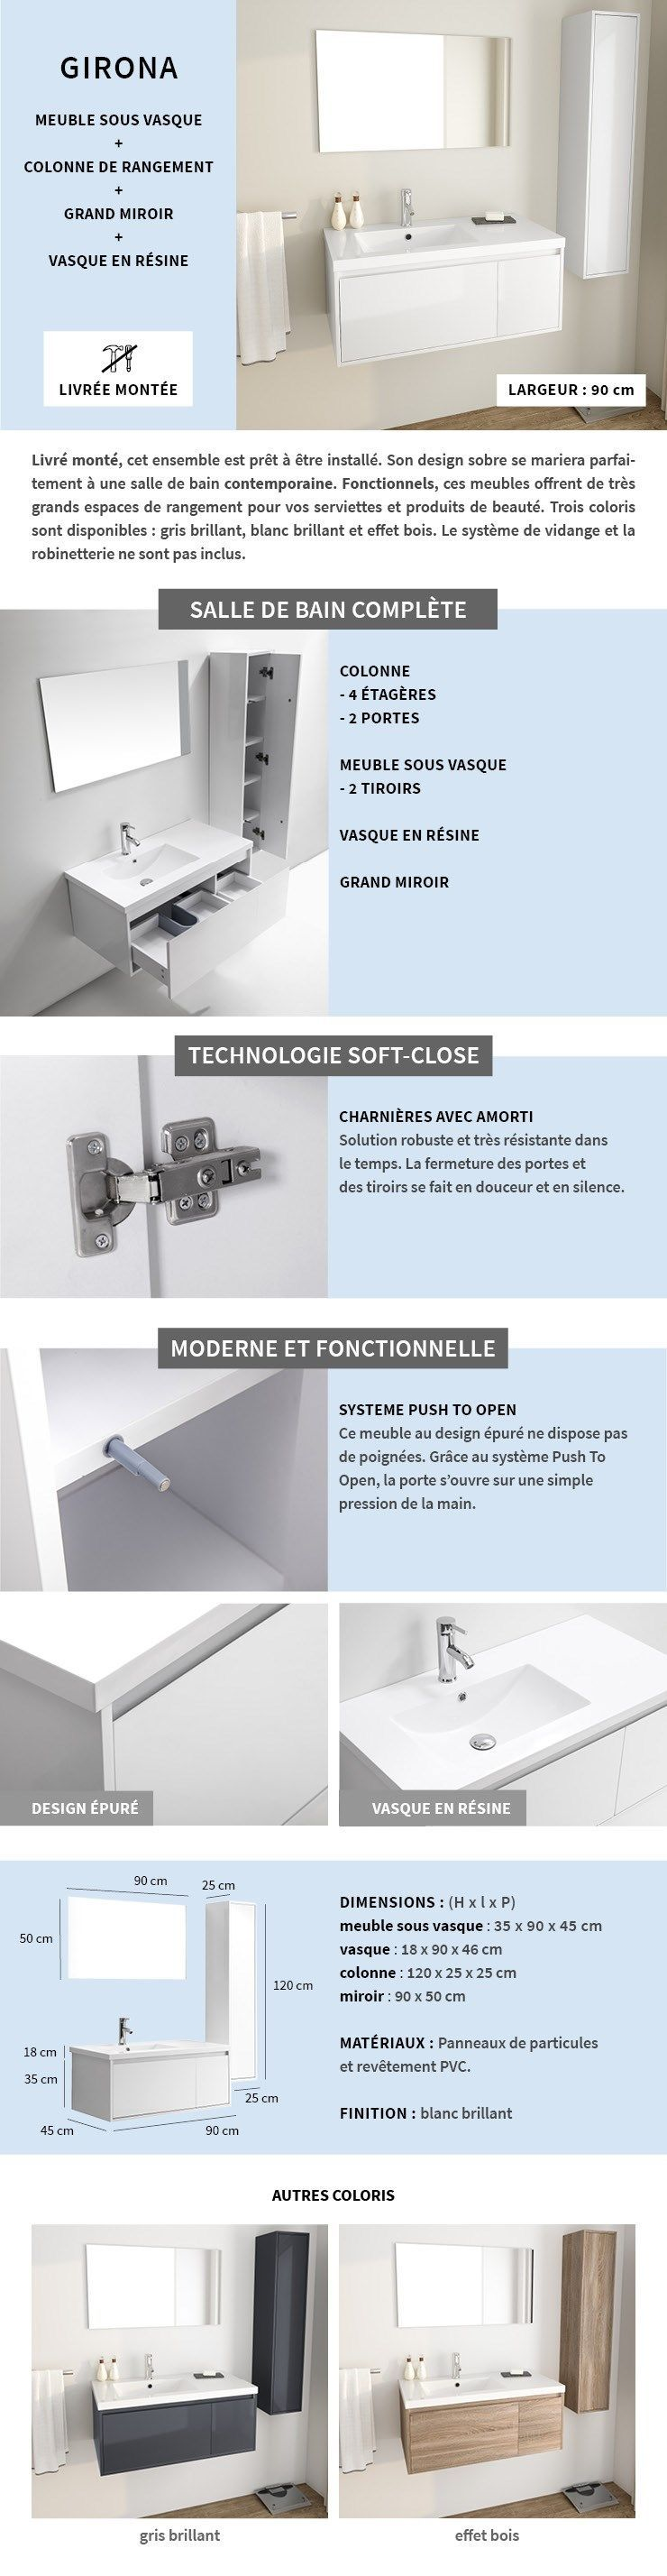 Armoire Salle De Bain Cdiscount ~ girona salle de bain compl te simple vasque l 90 cm blanc laqu